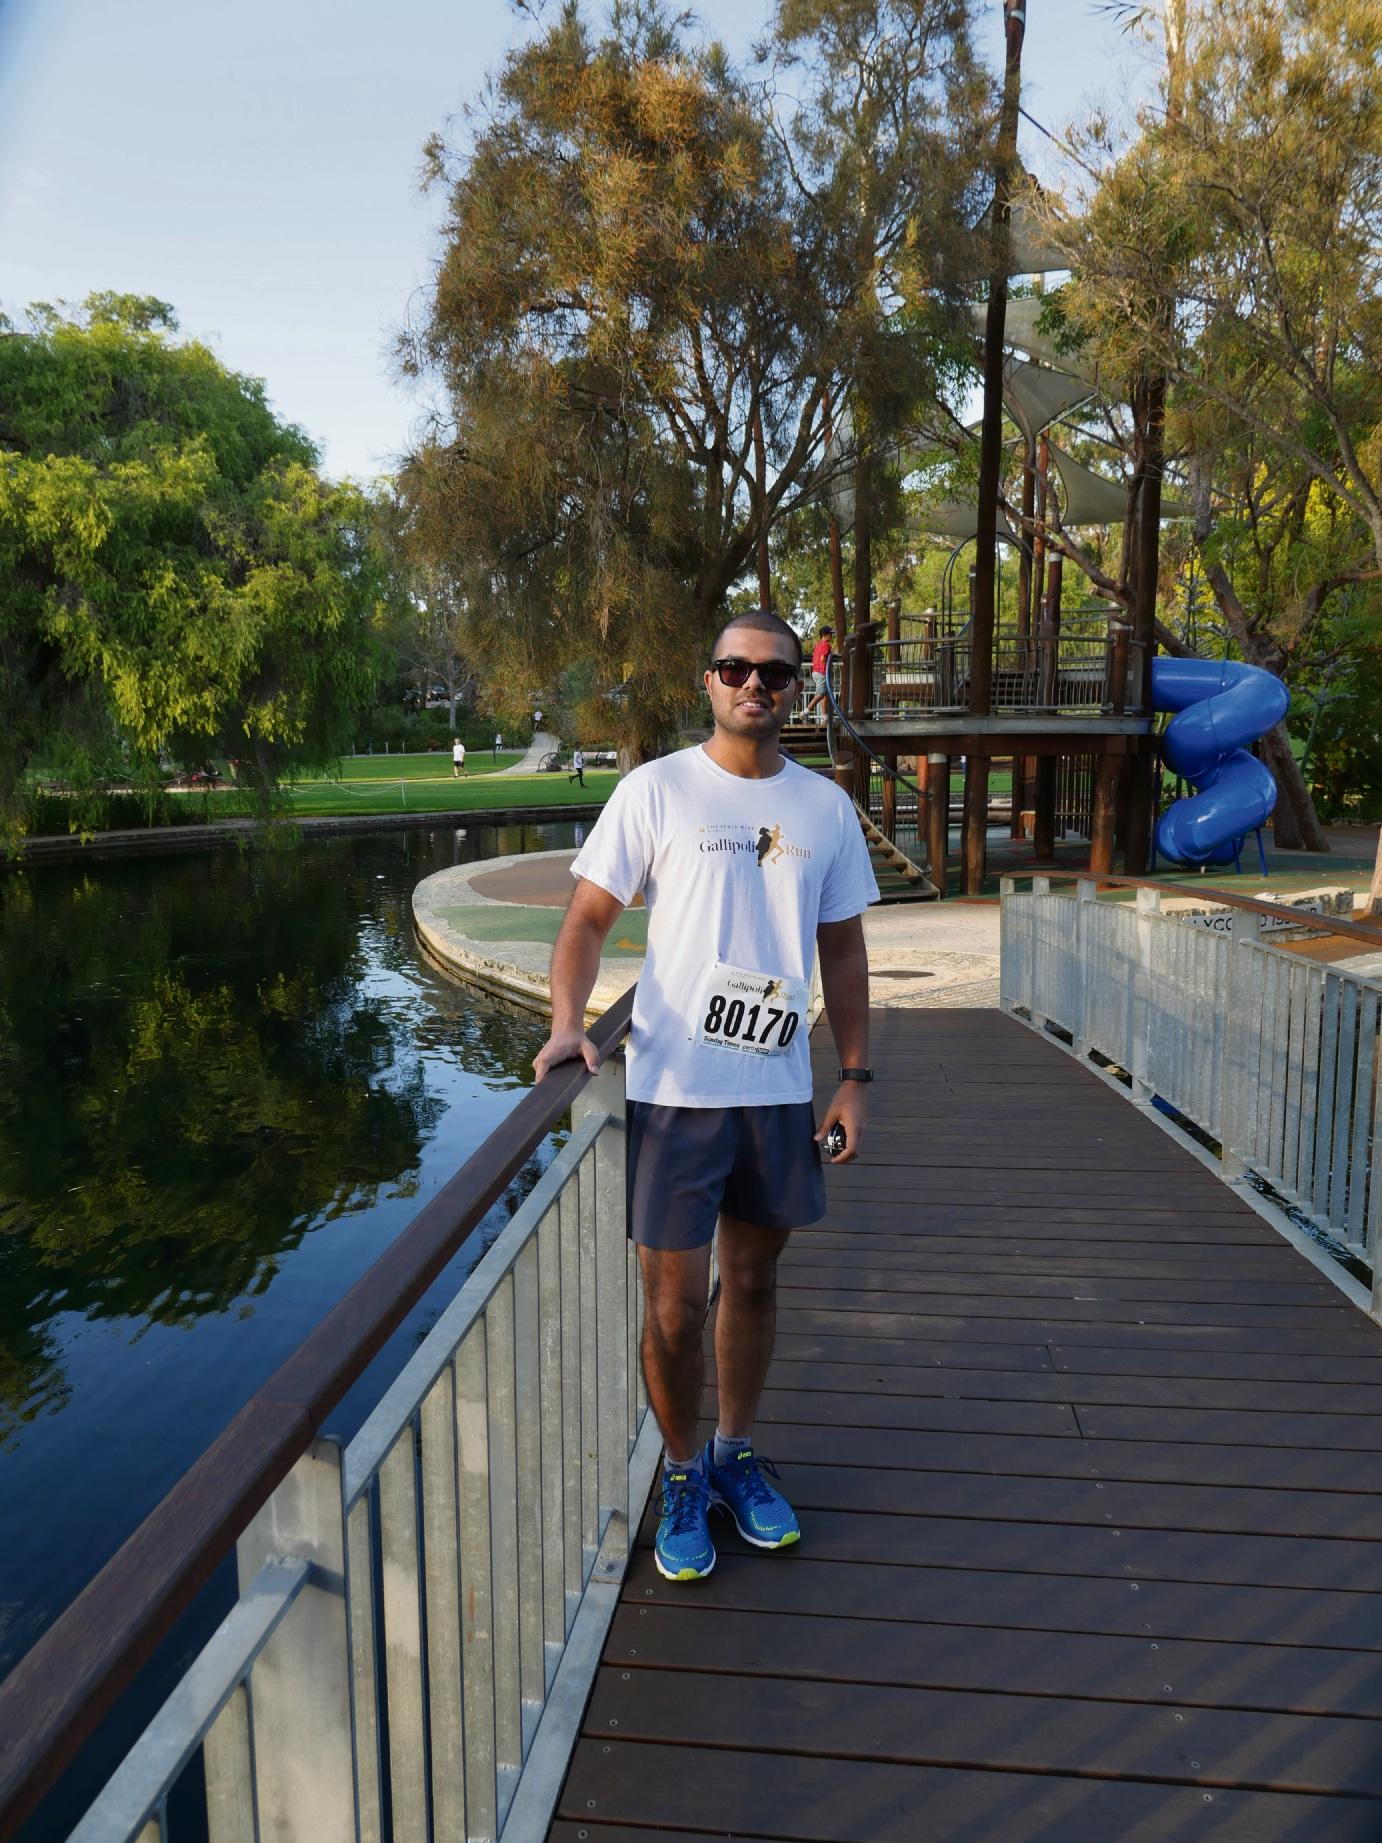 Ellenbrook resident Himanshu Vassanpal took part in the 8km Gallipoli run.